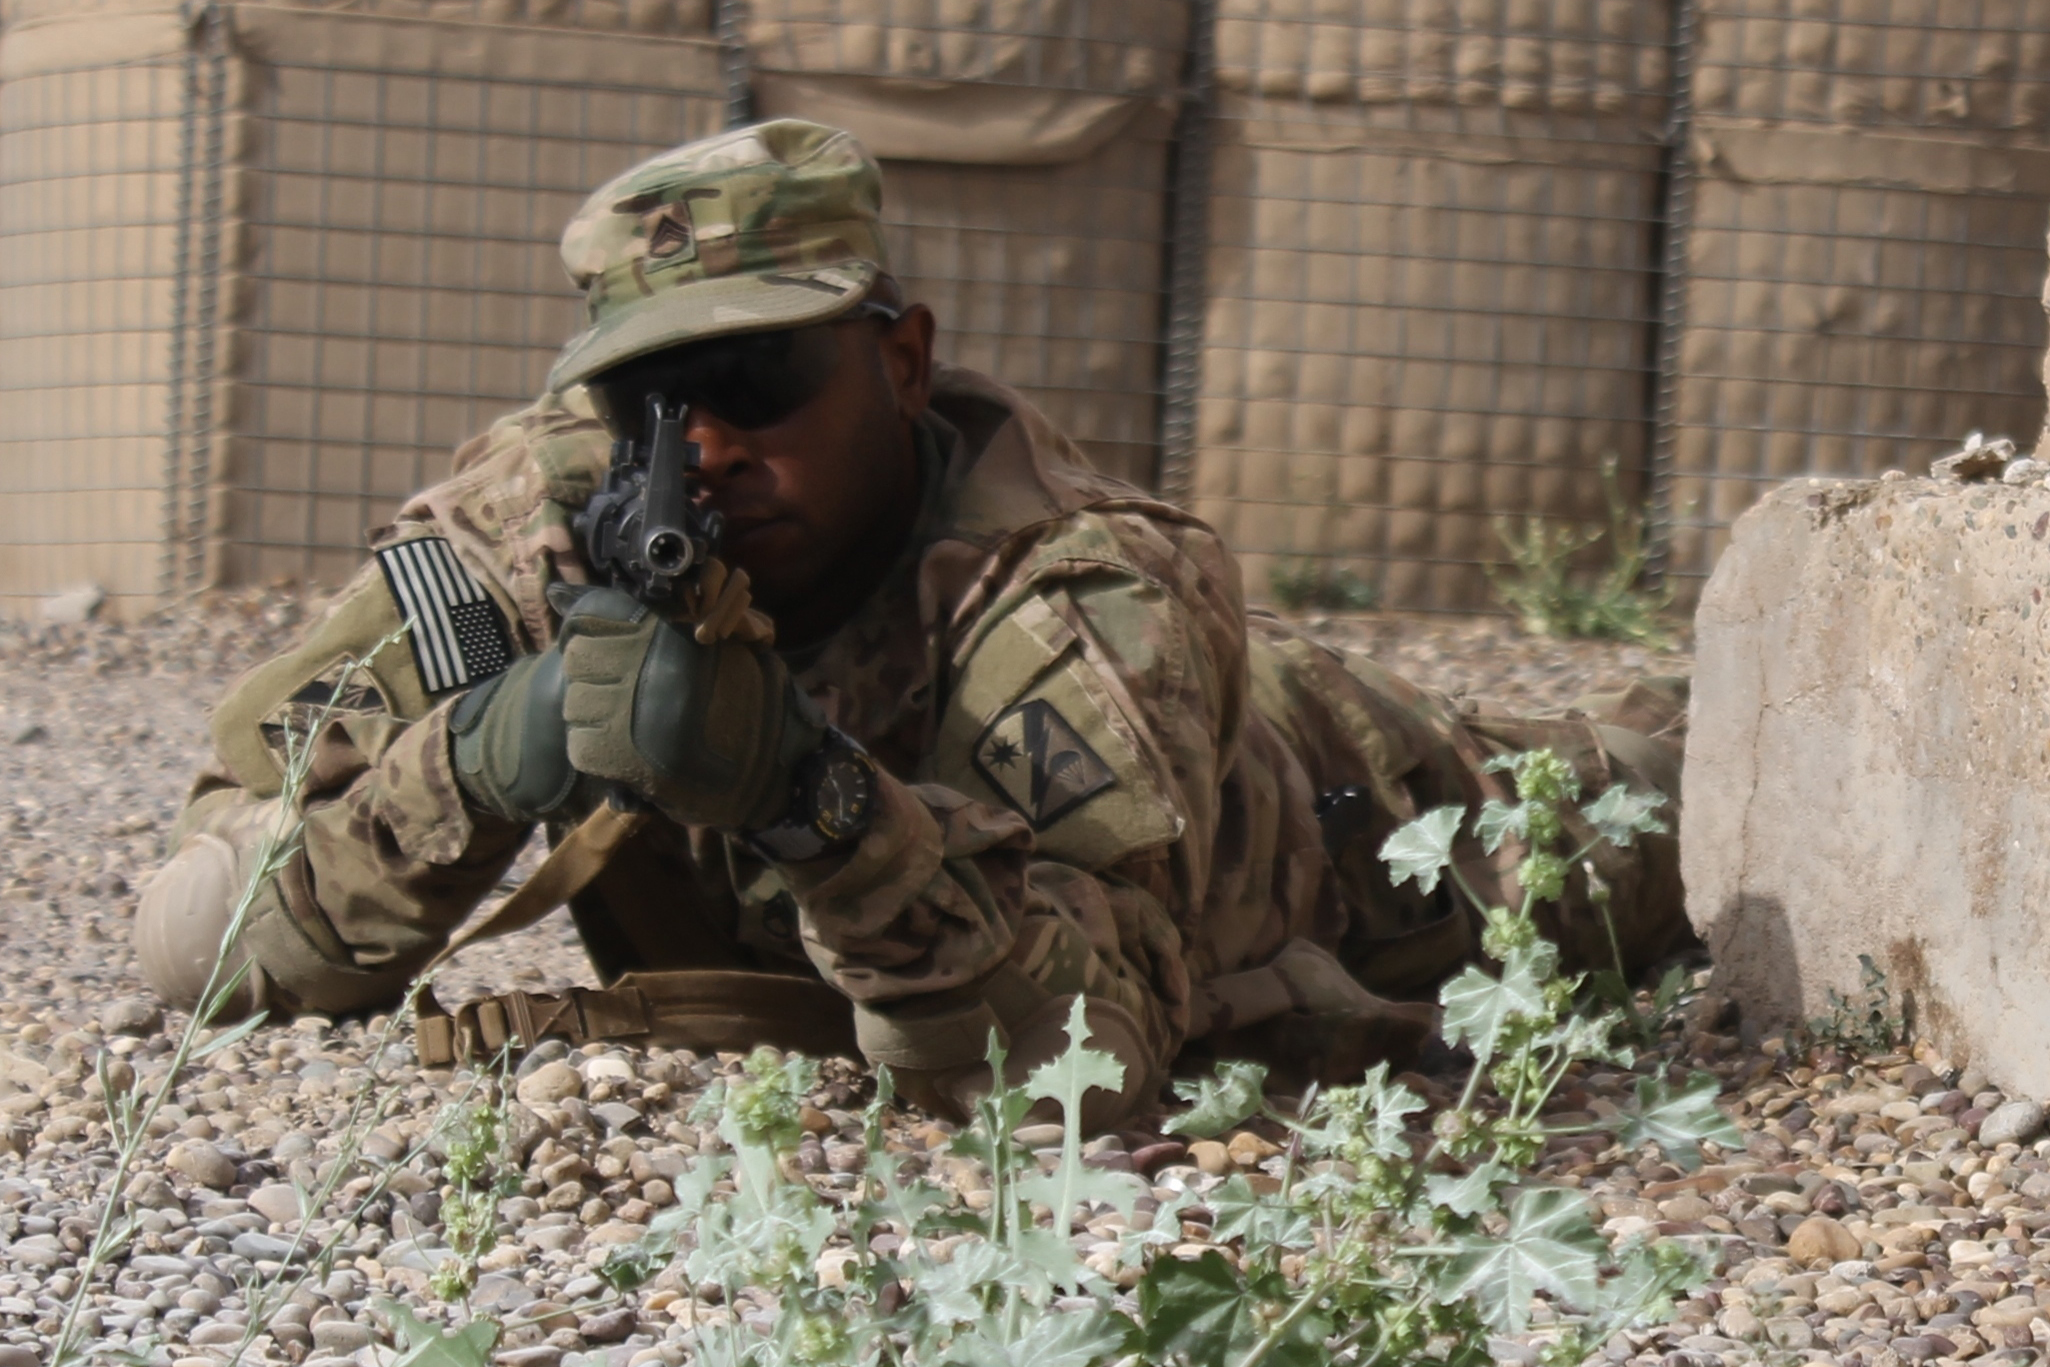 U S  DEPARTMENT OF DEFENSE > Photos > Photo Gallery